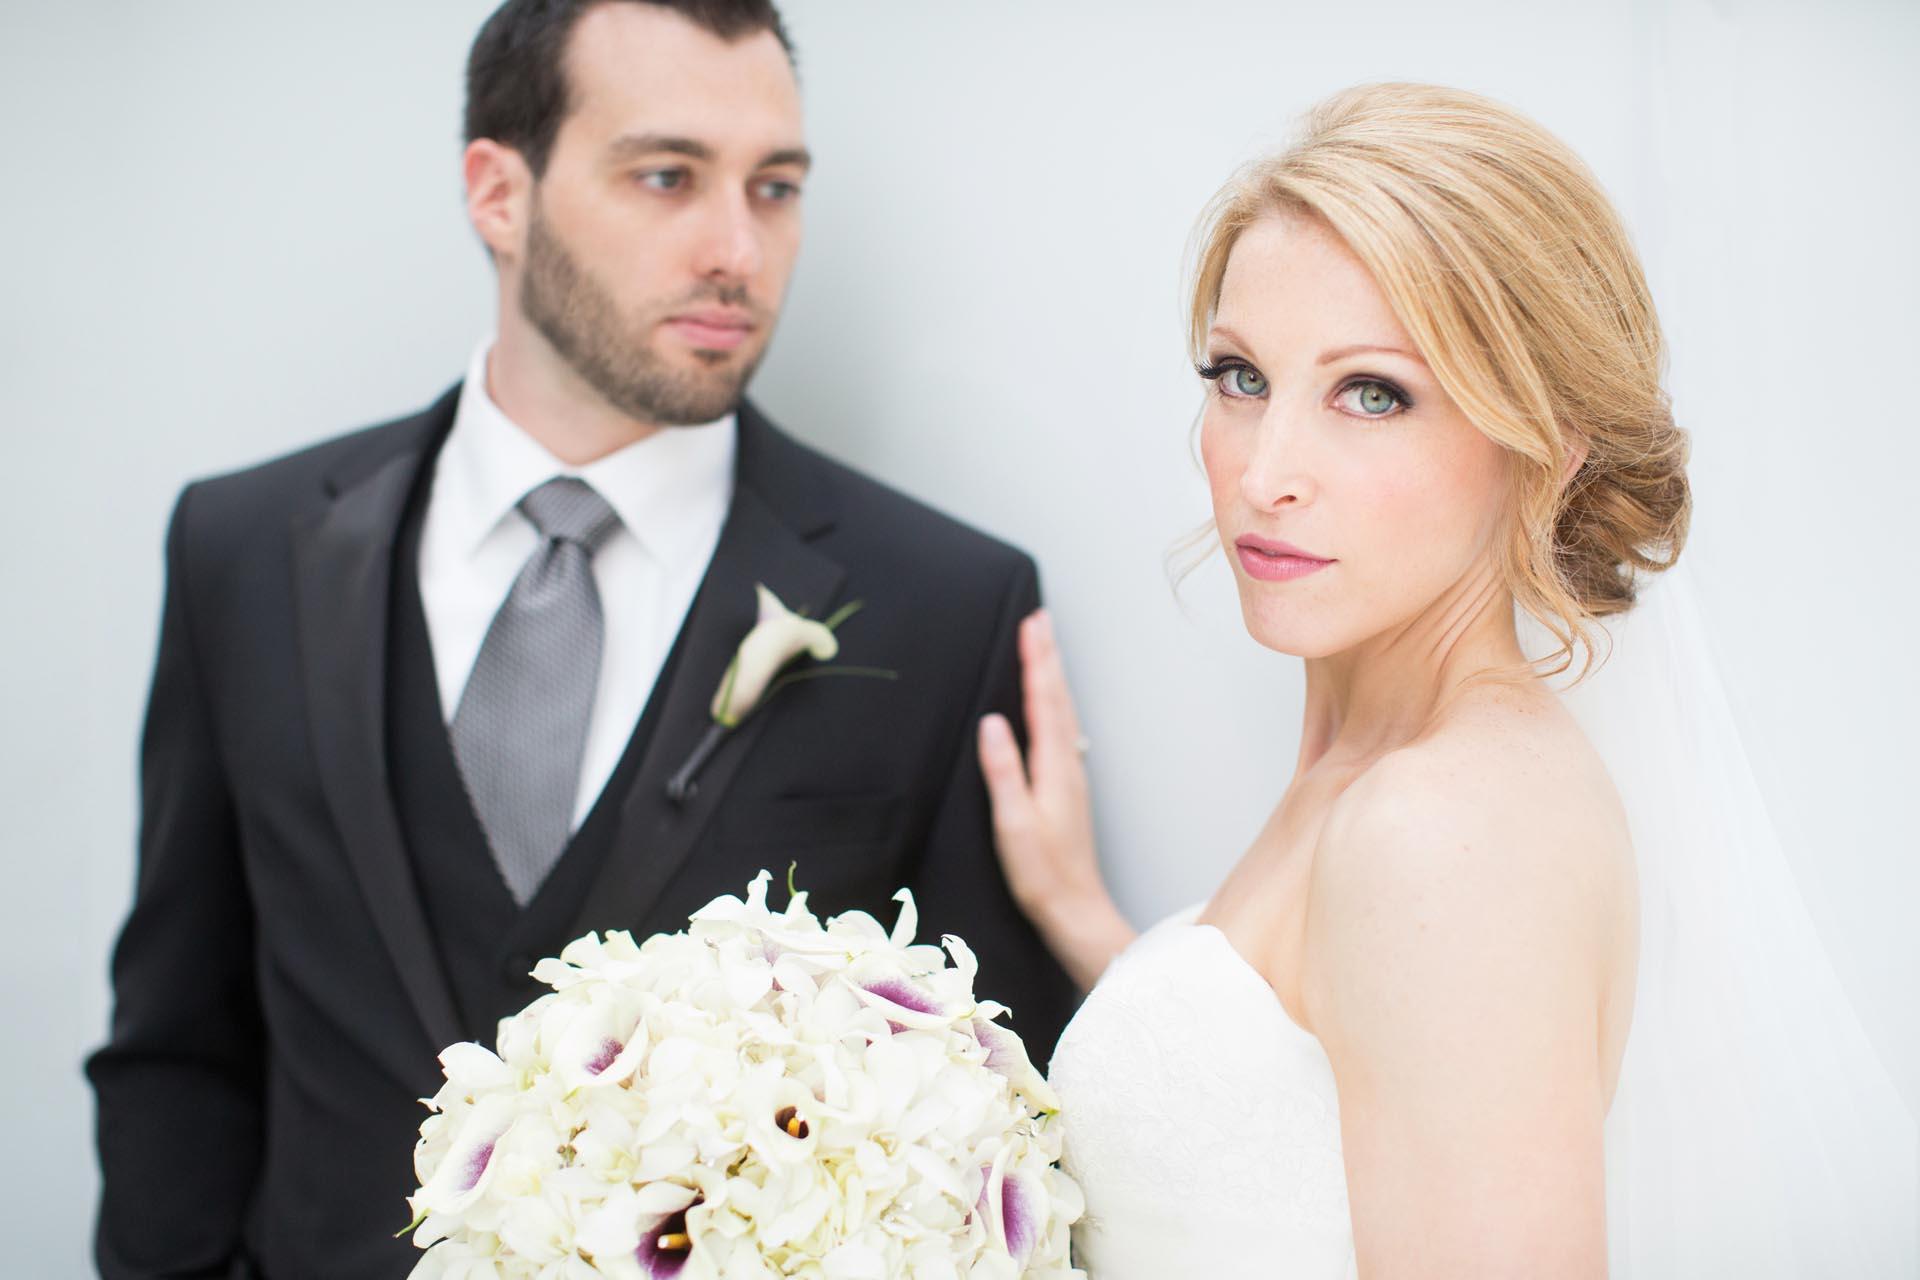 husband-wife-chicago-wedding-photographer-team